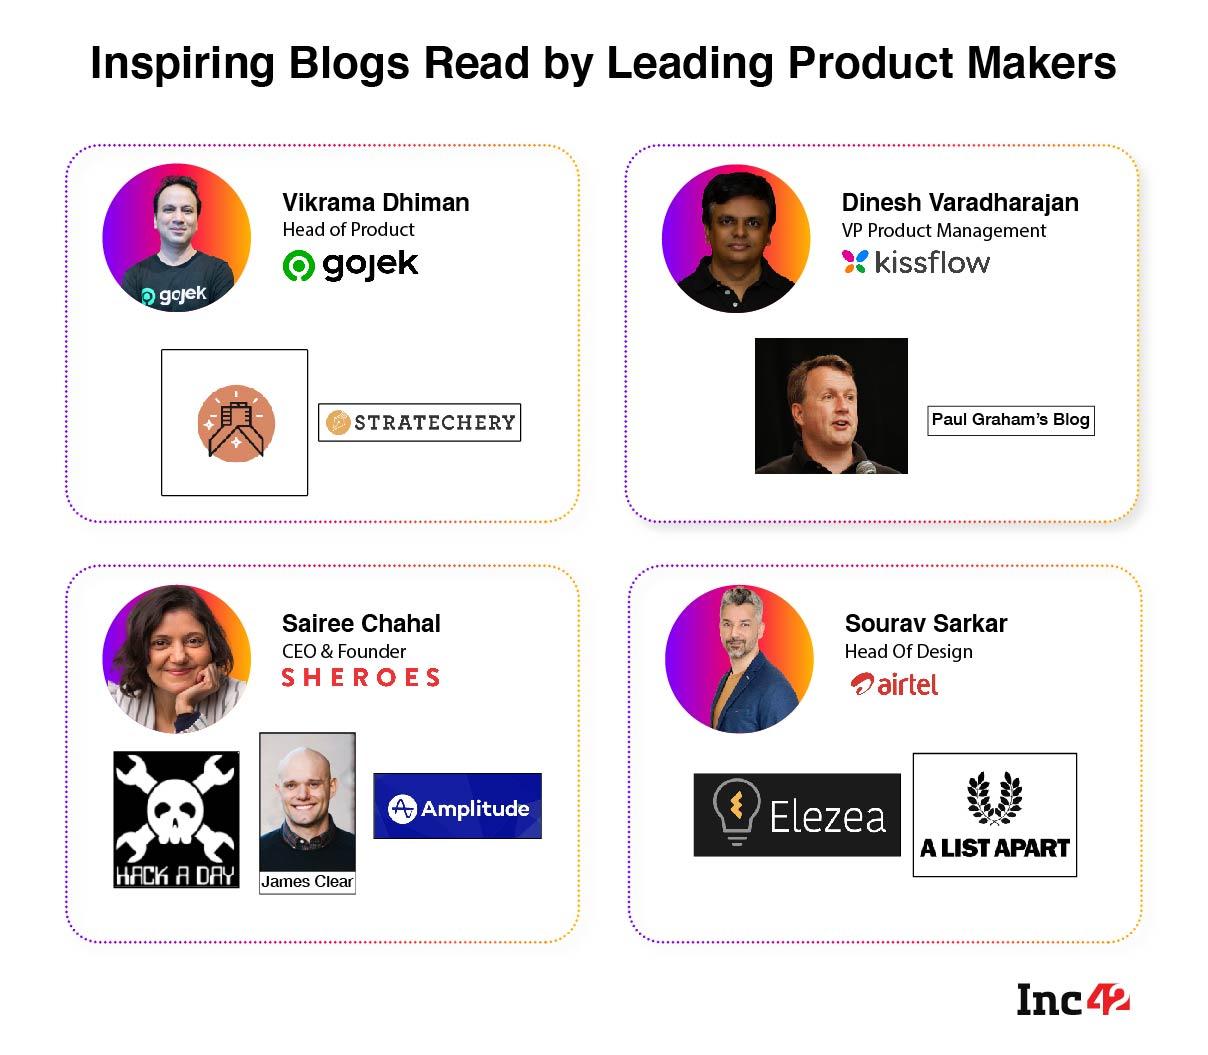 The Top 10 Blogs Read By Product Leaders Of Companies Like Airtel, Gojek, Kissflow